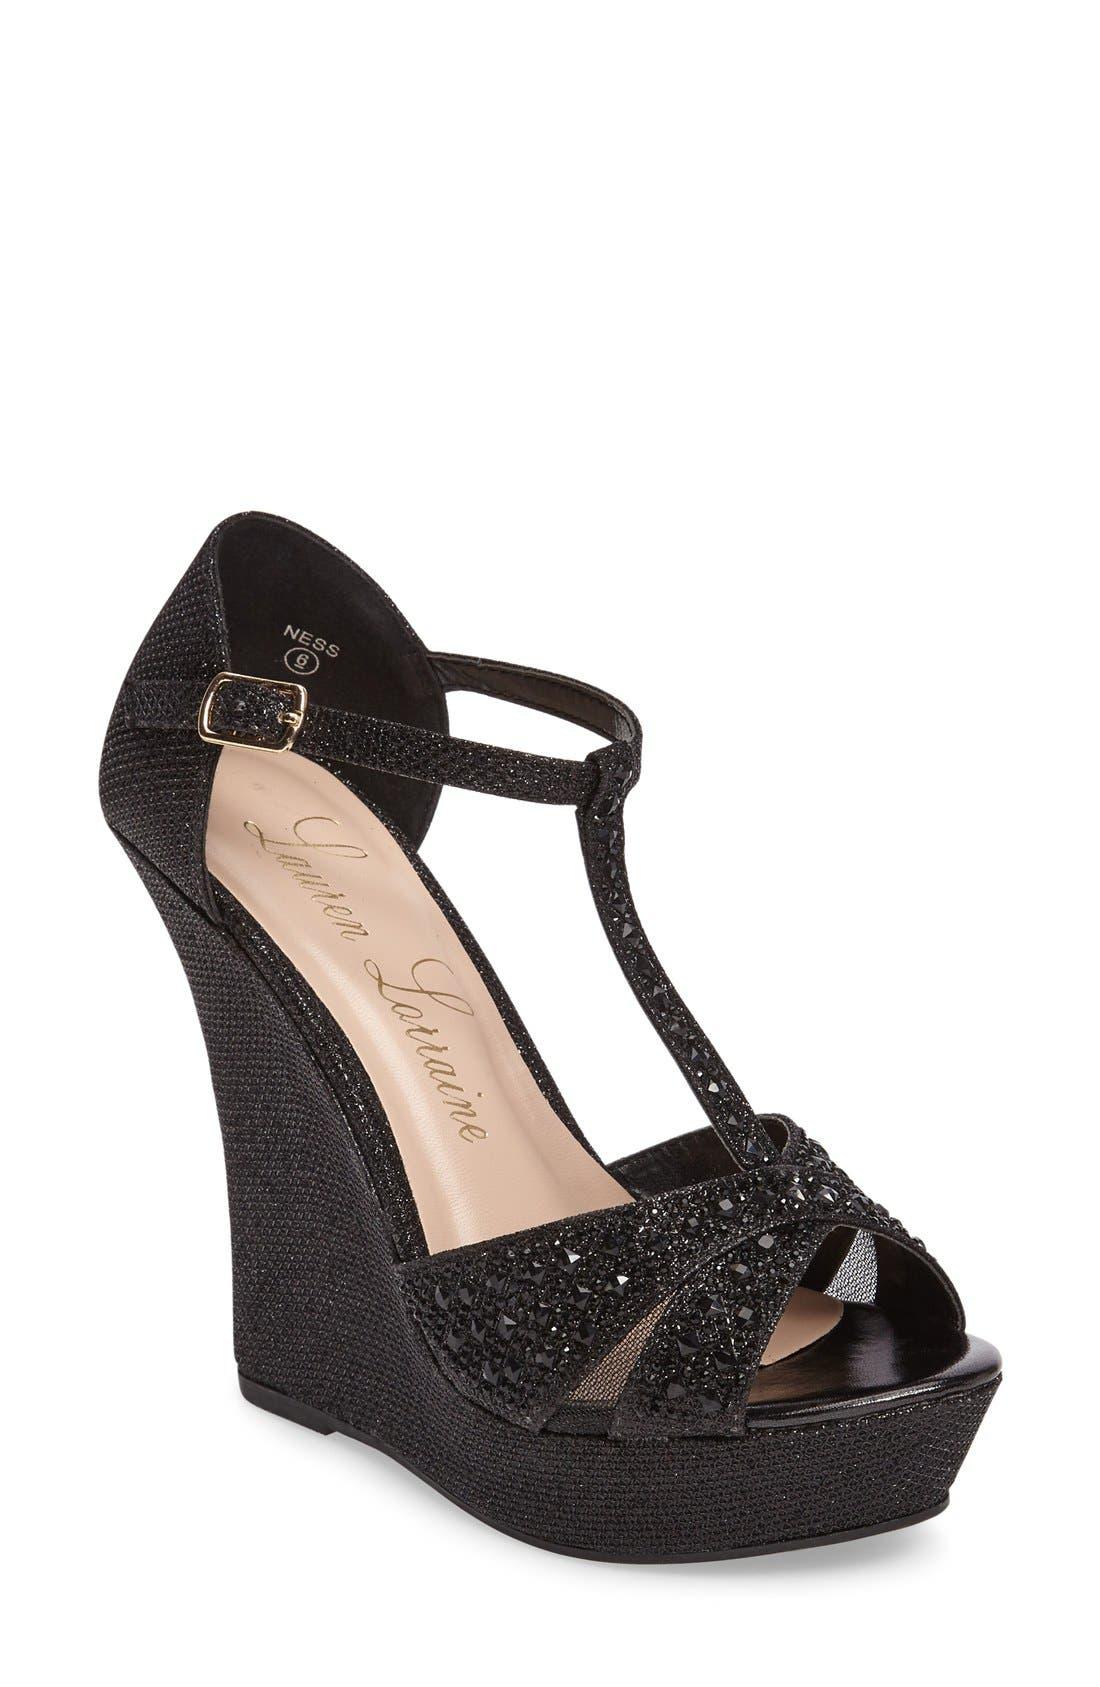 Lauren Lorraine Ness Crystal Embellished Wedge Sandal (Women)